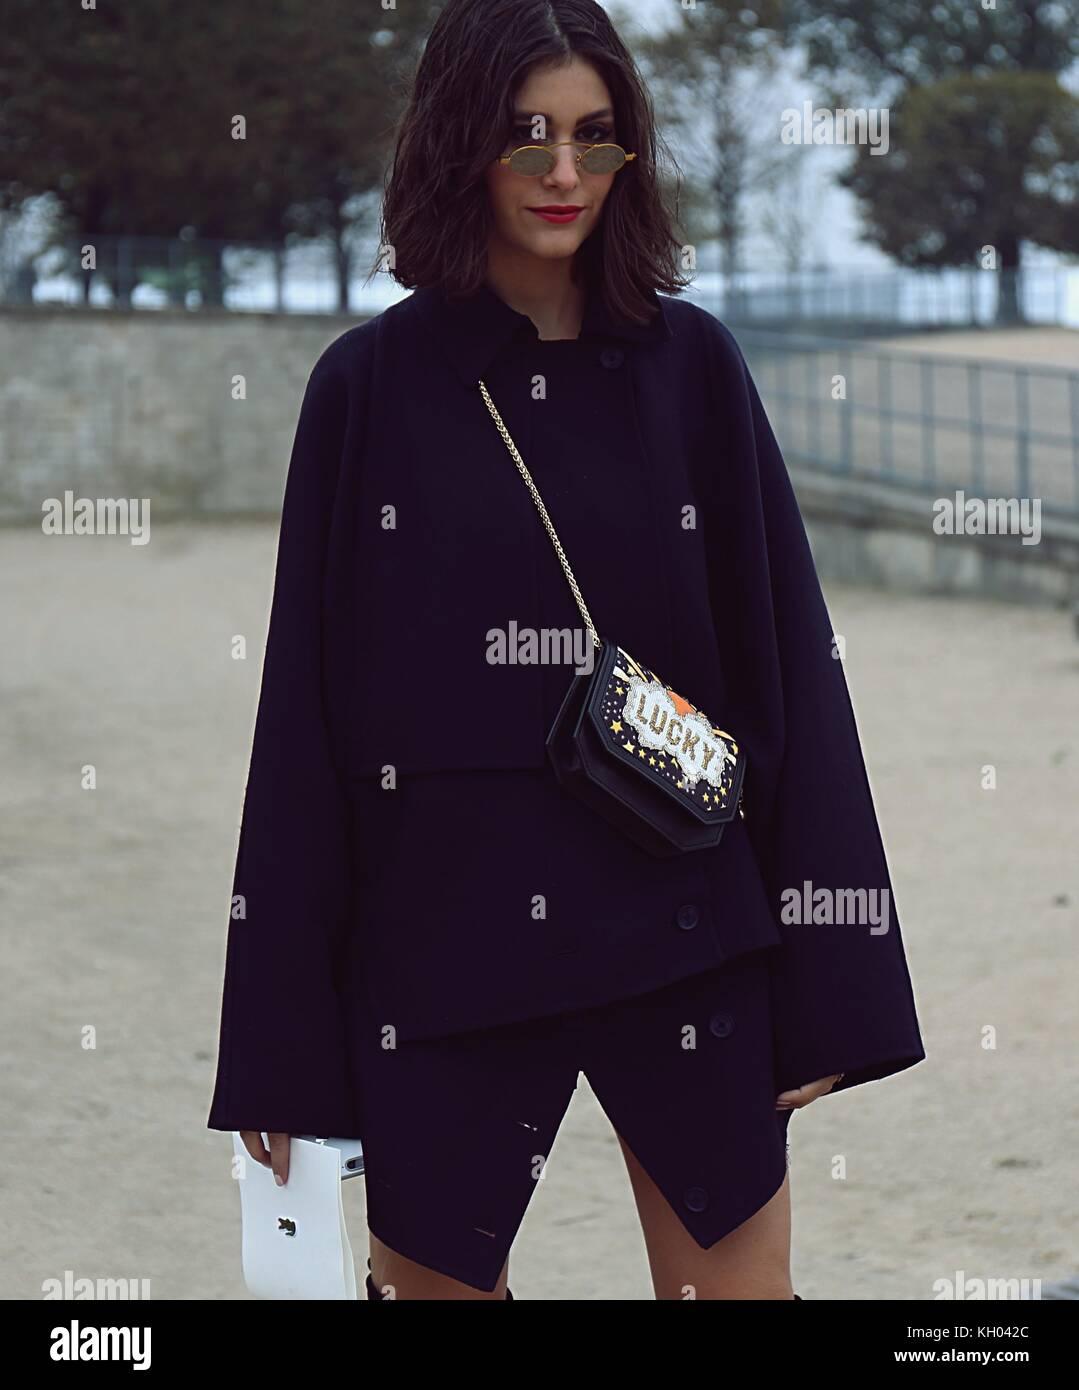 PARIS- 27 September 2017 Woman on the street during the Paris Fashion Week - Stock Image